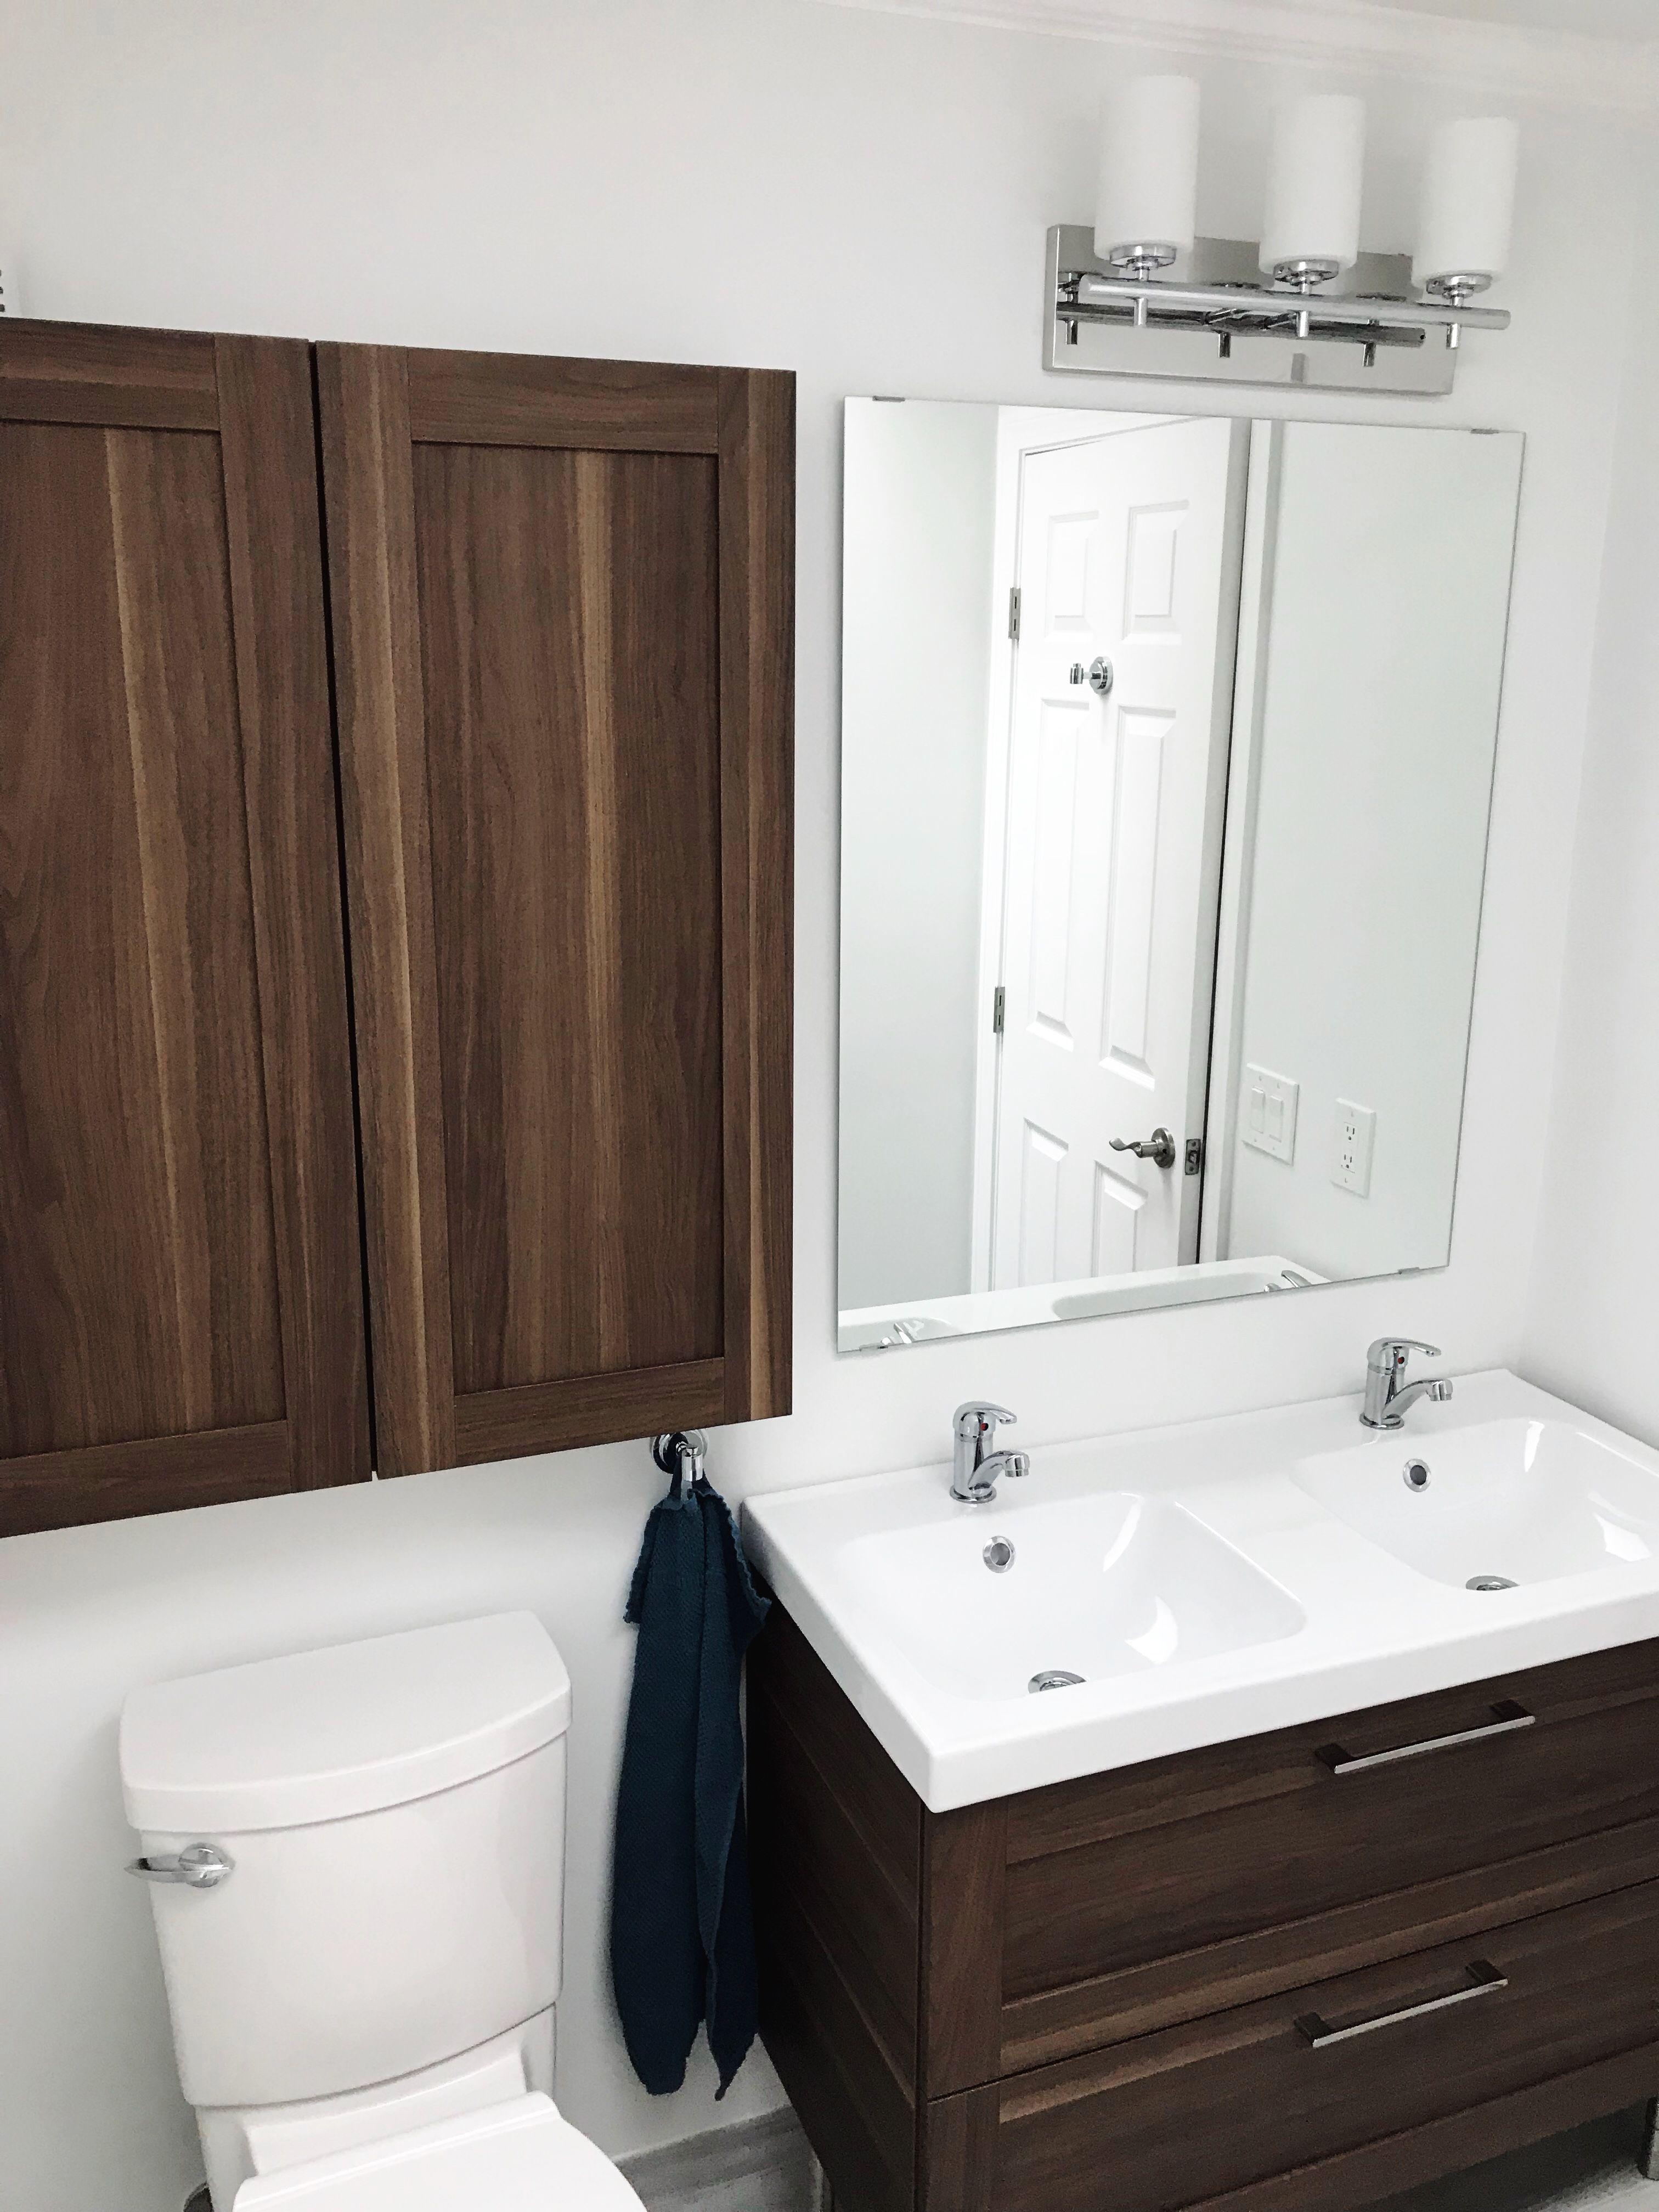 Ikea Godmorgon Walnut Bathroom Vanity With Double Sinks Ikea